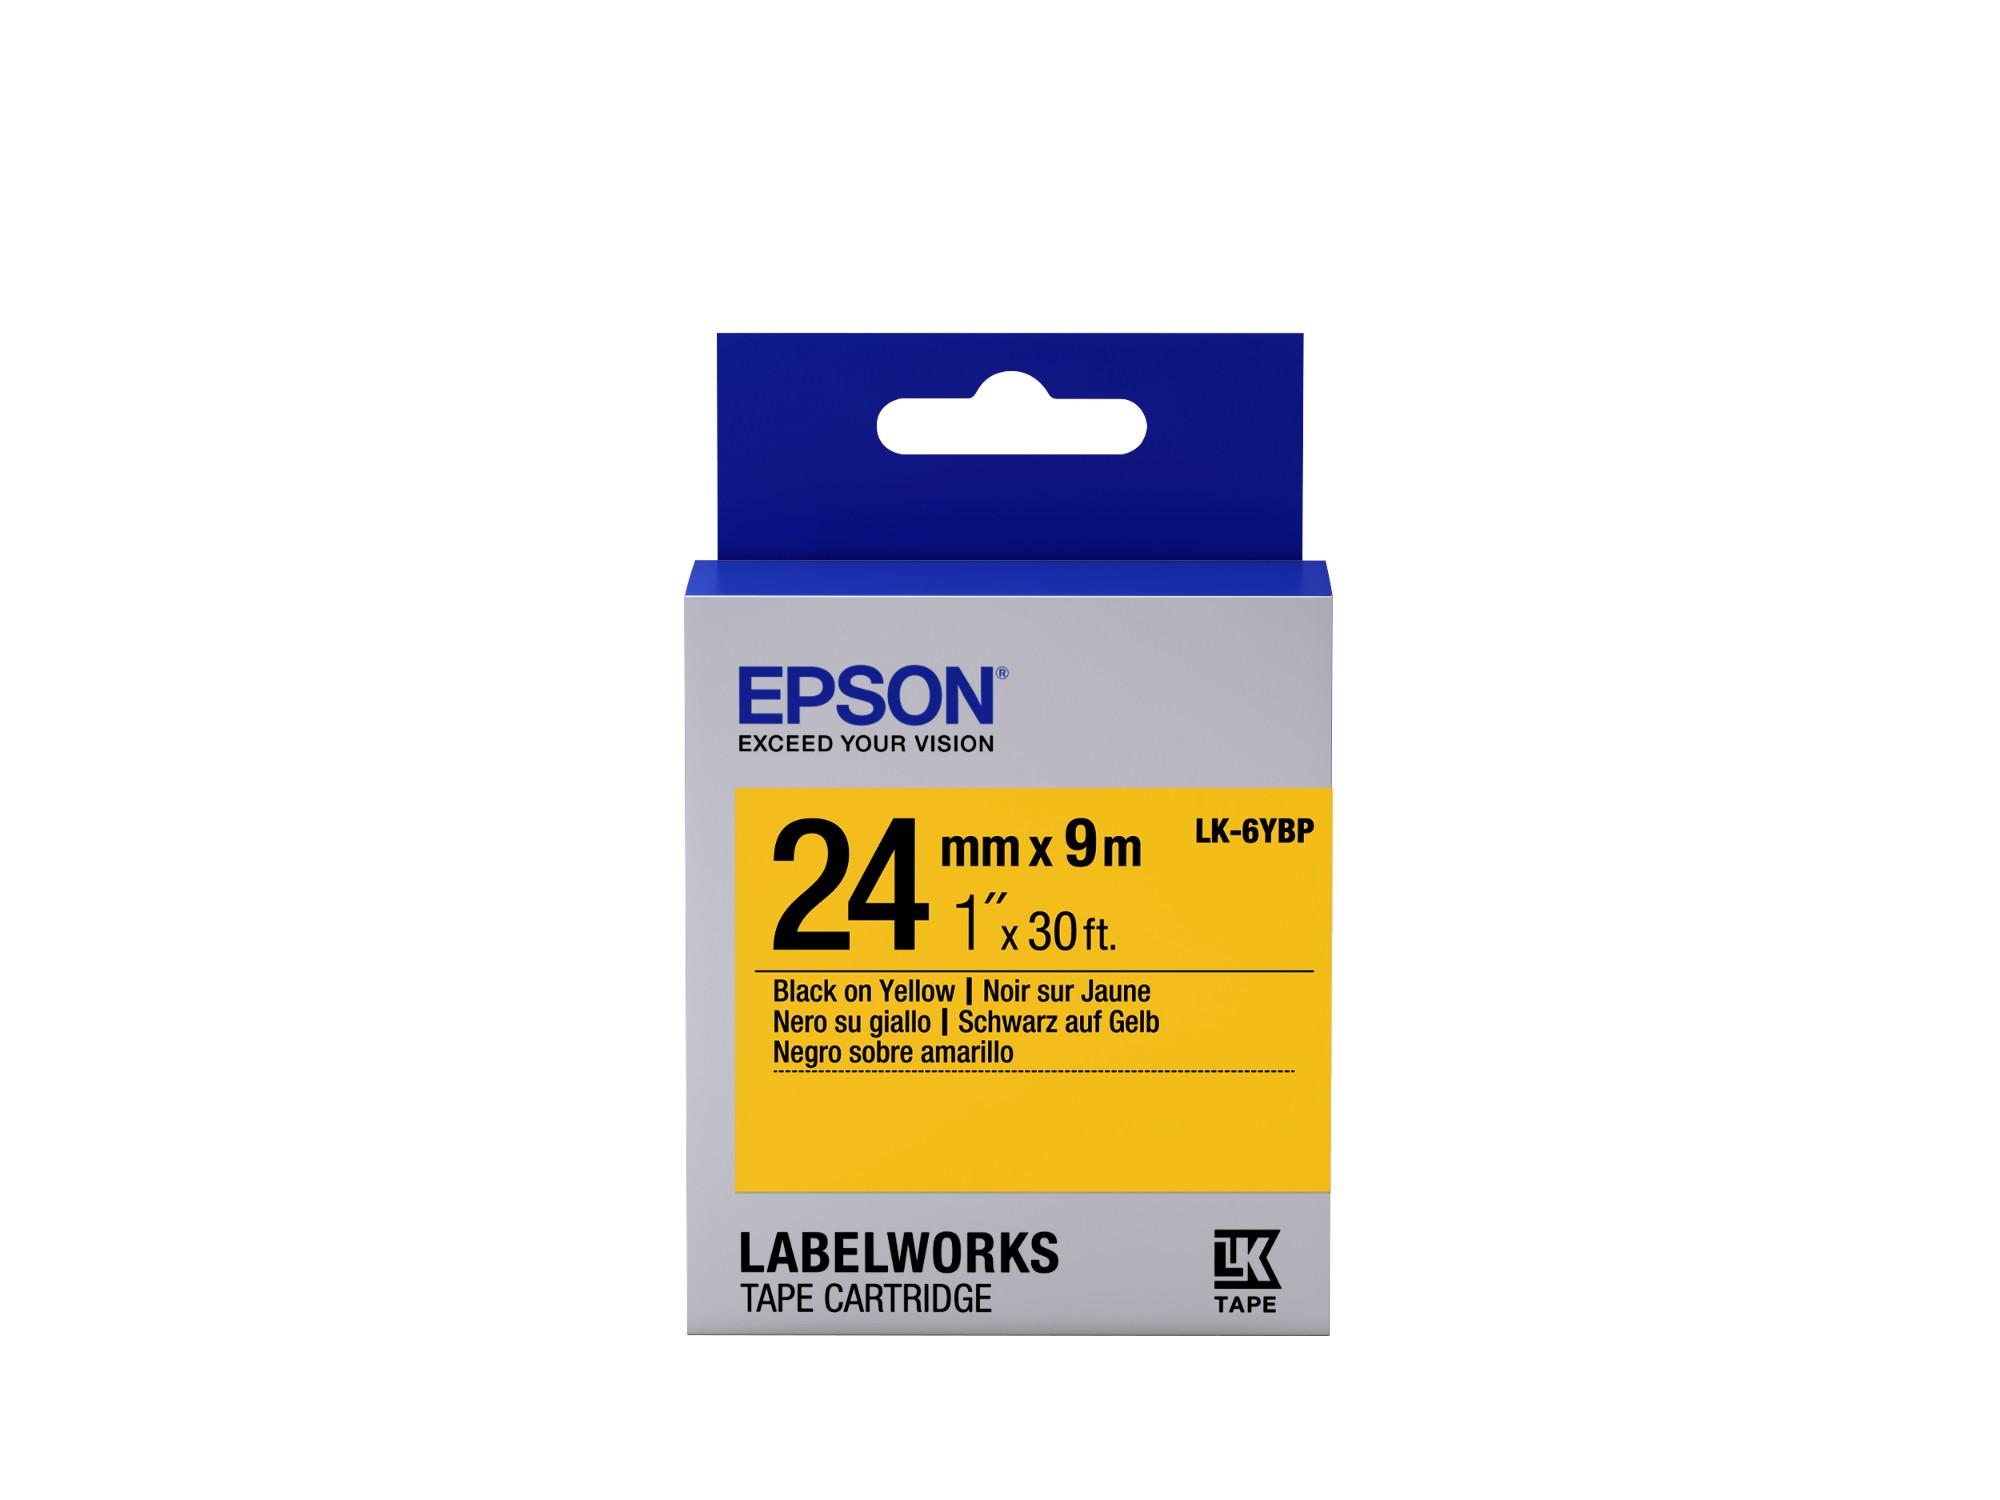 Epson Pastel Tape - LK-6YBP Pastel Blk/Yell 24/9